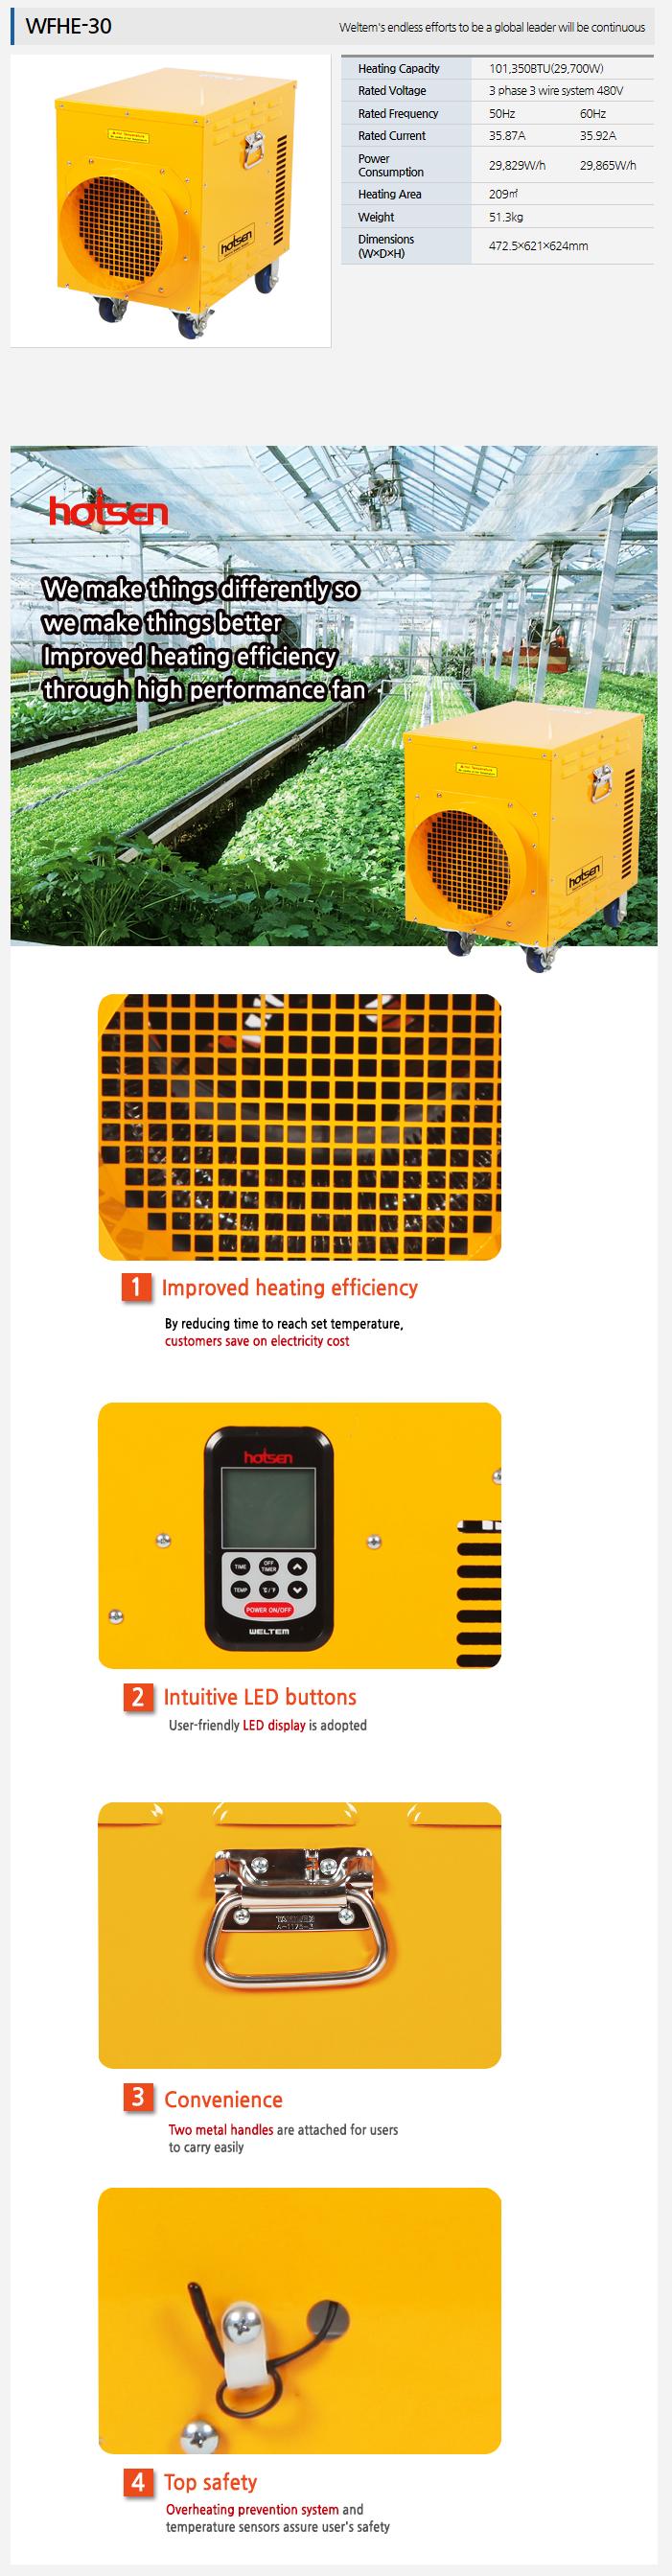 WELTEM Electric Blower Heater (480V) WFHE-30